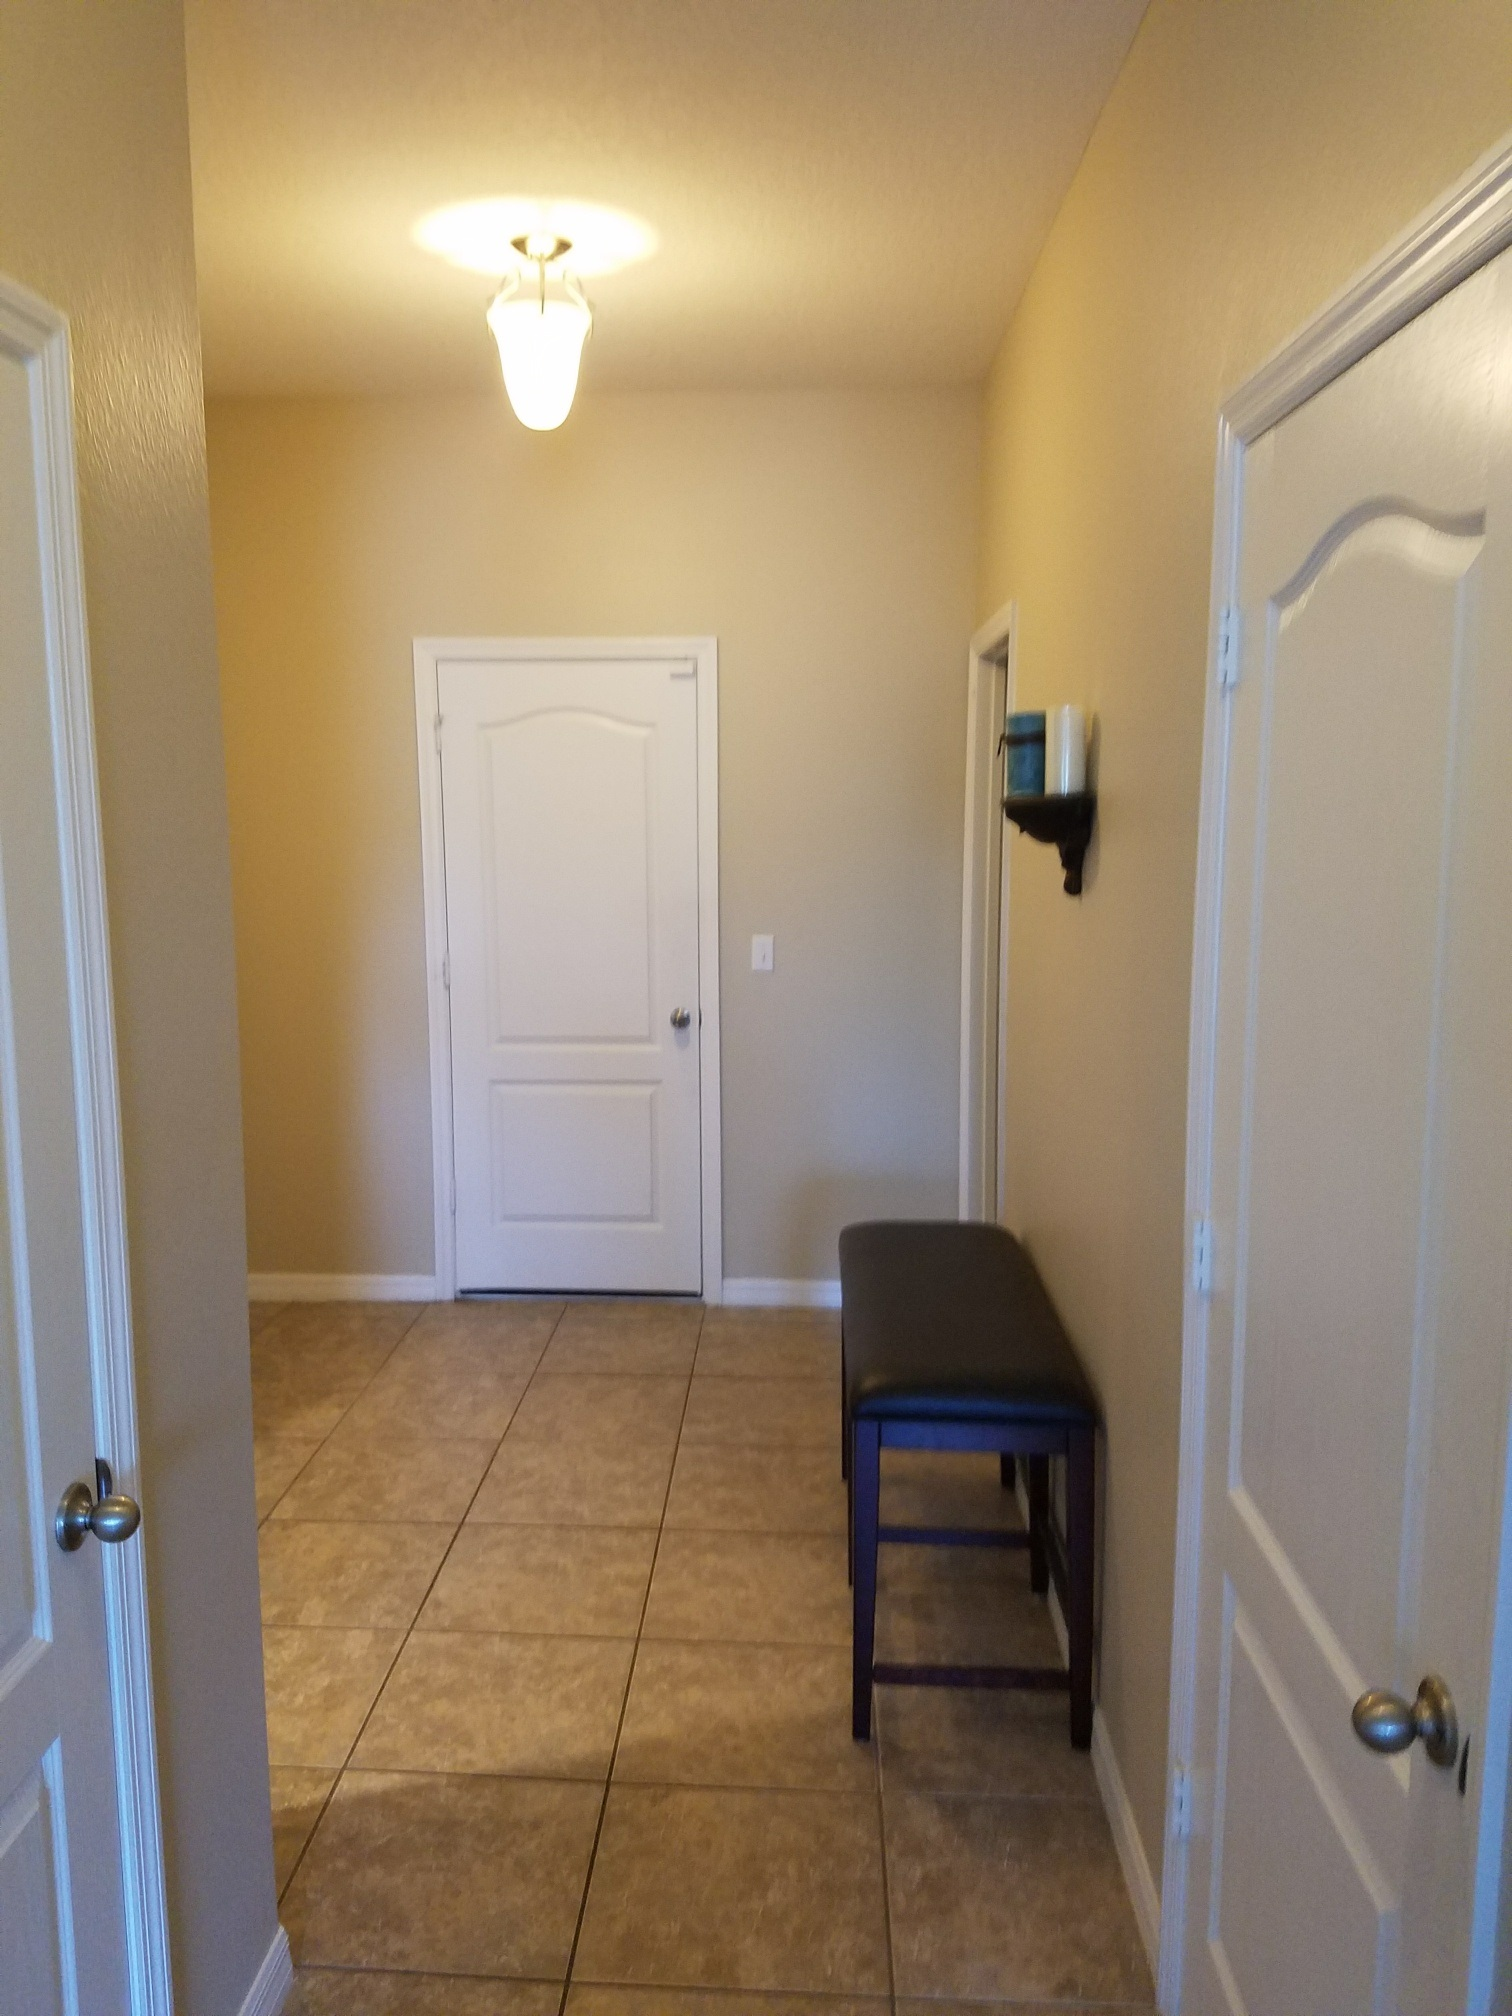 Home for rent 1234 Scarlet Oak Loop, Winter Garden, FL 34787 | Pathlig